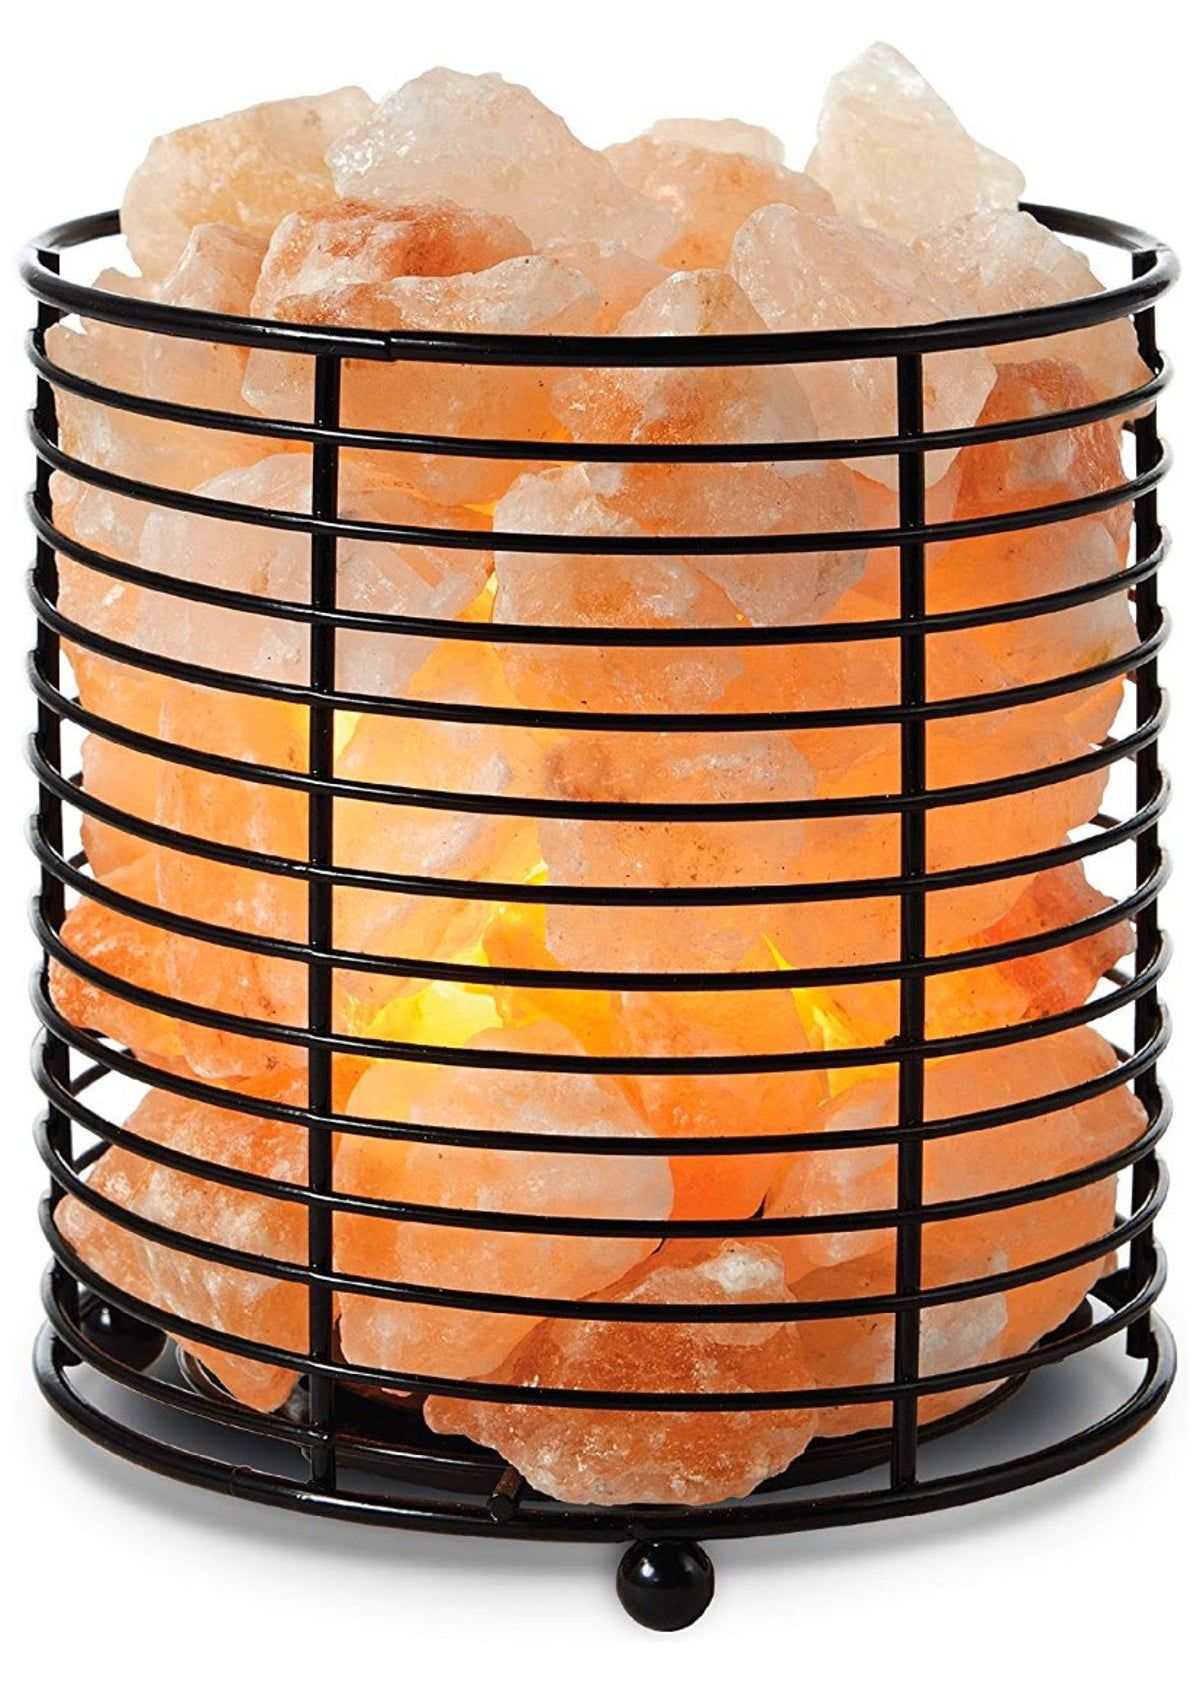 Himalayan Salt Crystal Lamp W Metal Bask In 2020 Salt Crystal Lamps Himalayan Salt Lamp Salt Lamp